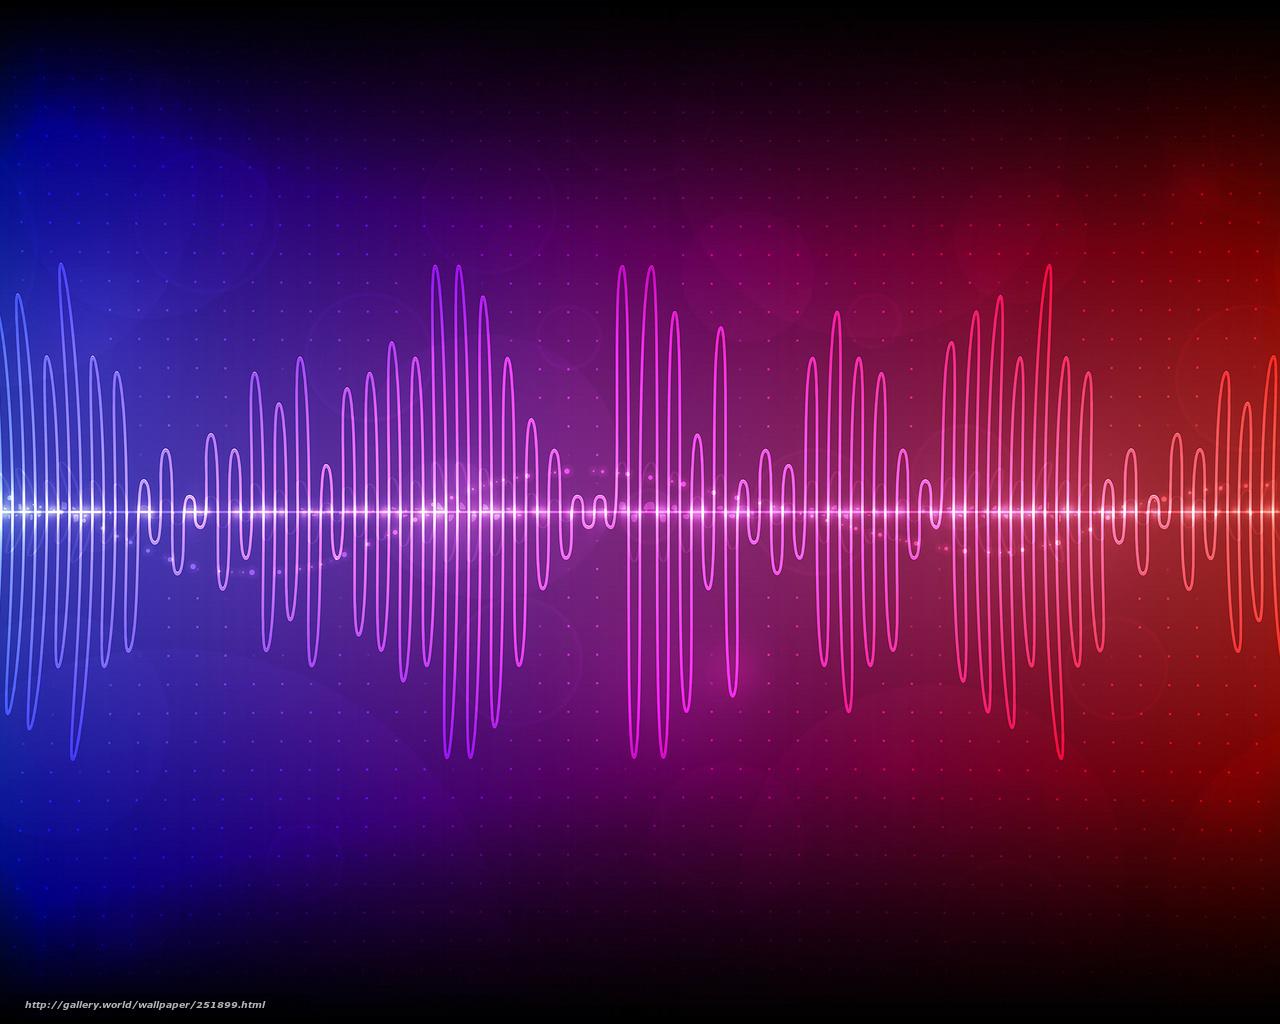 Video Killed the Radio Star  Wikipedia